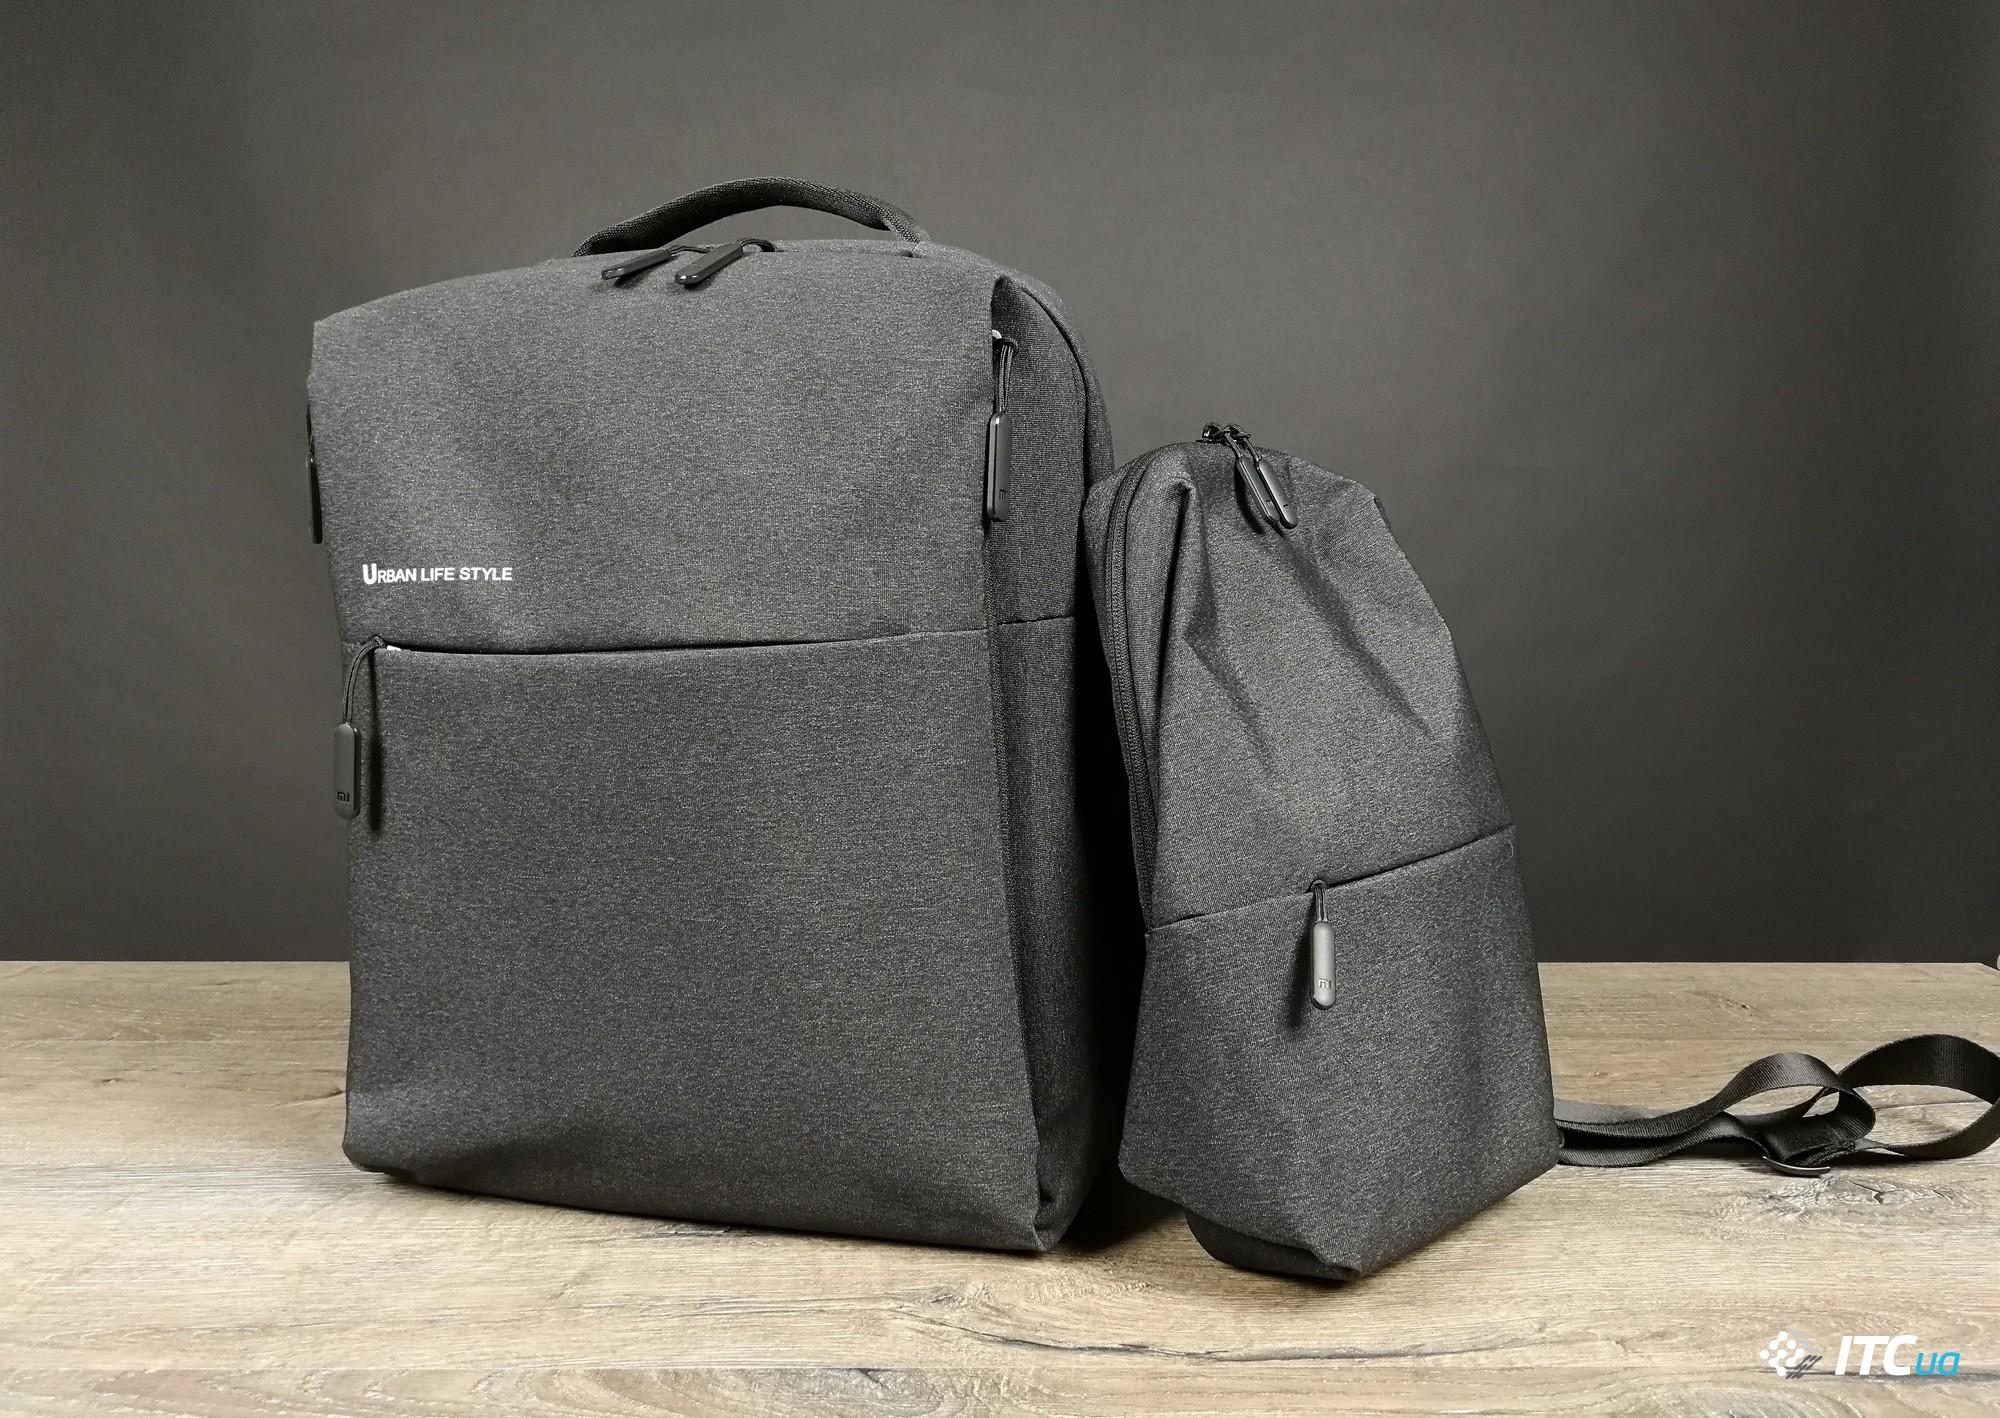 d3e01b1138fe Все от Xiaomi  обзор рюкзака Mi minimalist urban и сумки Mi  multi-functional urban